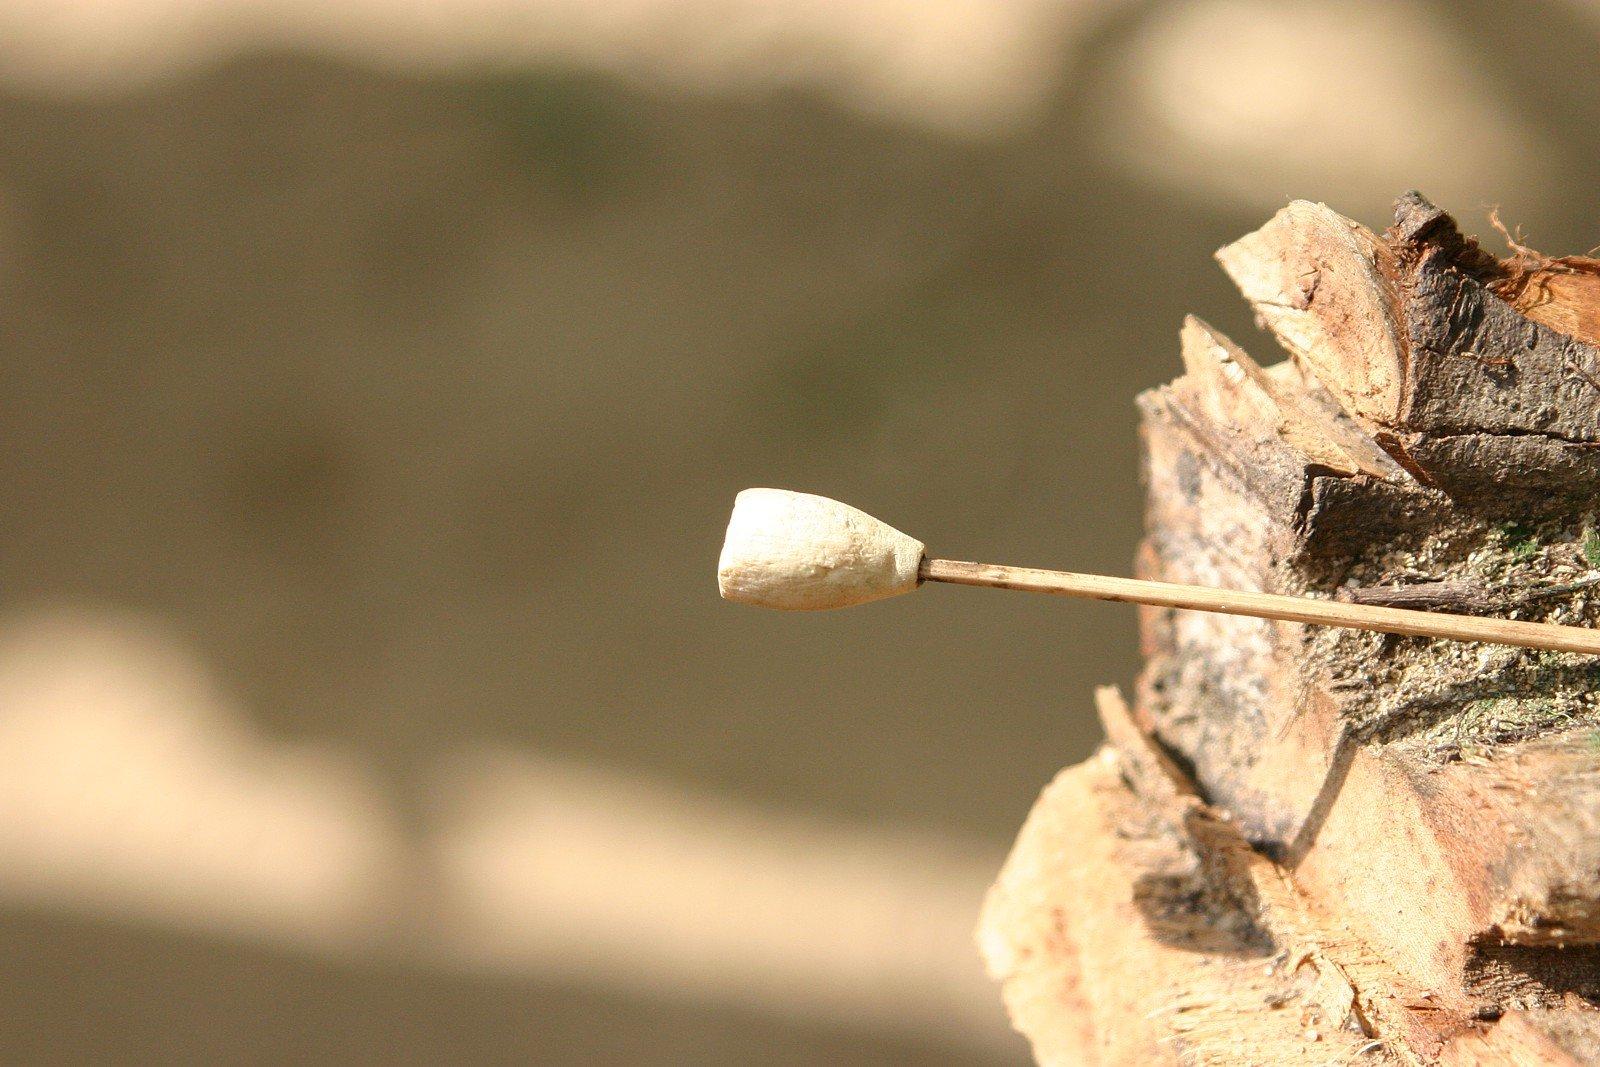 Taman Negara - Blowpipe dart f